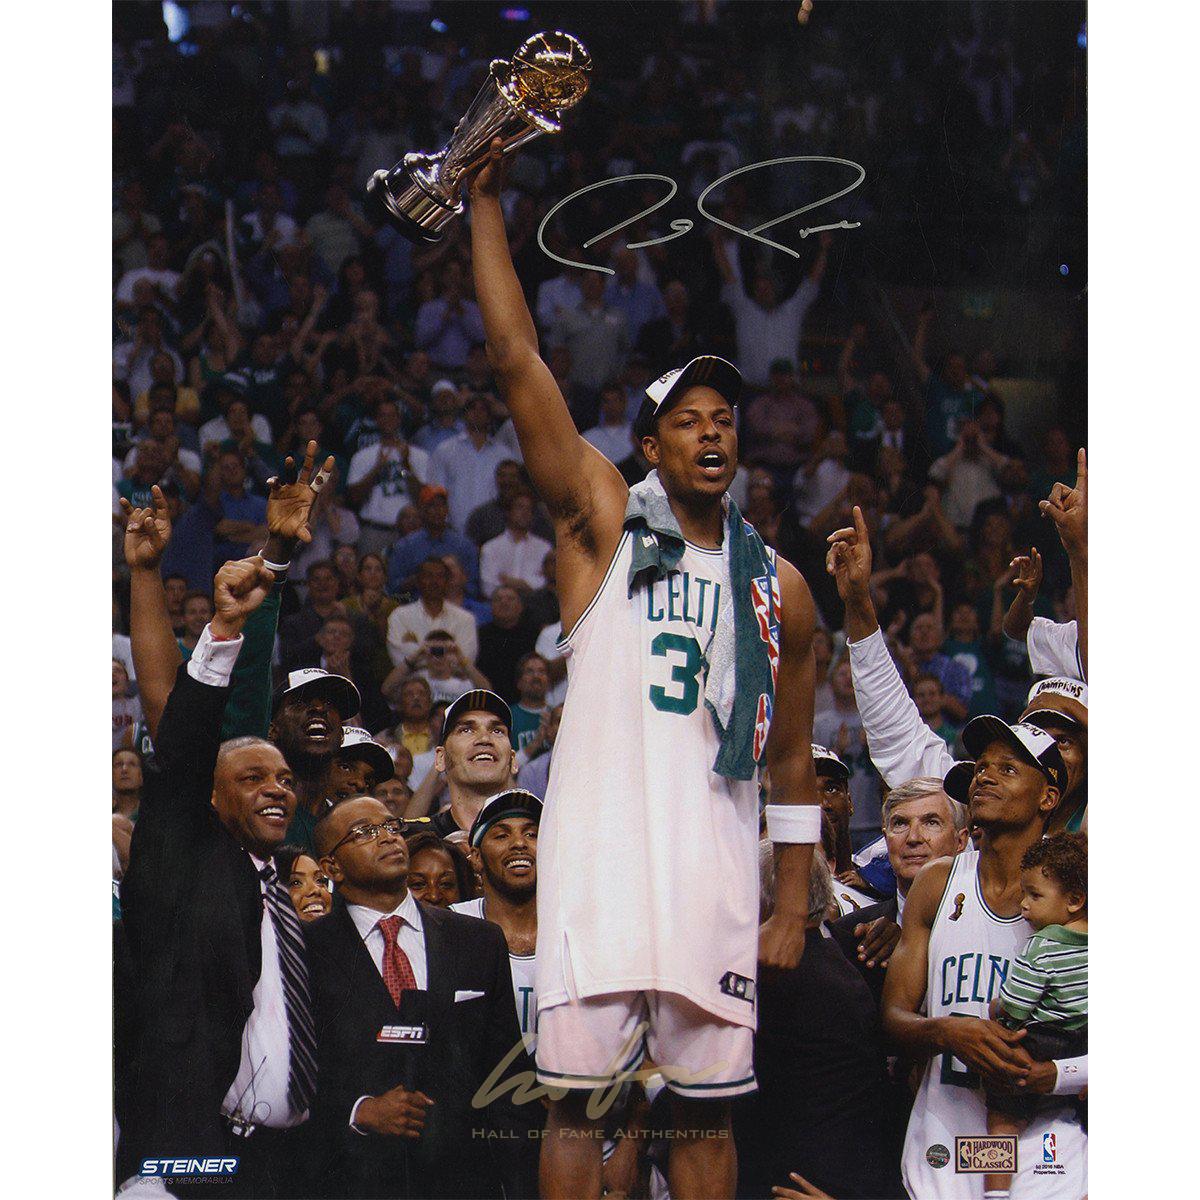 finest selection 886c4 00cd5 Paul Pierce Signed 16x20 Holding Up 2008 NBA Finals MVP Trophy